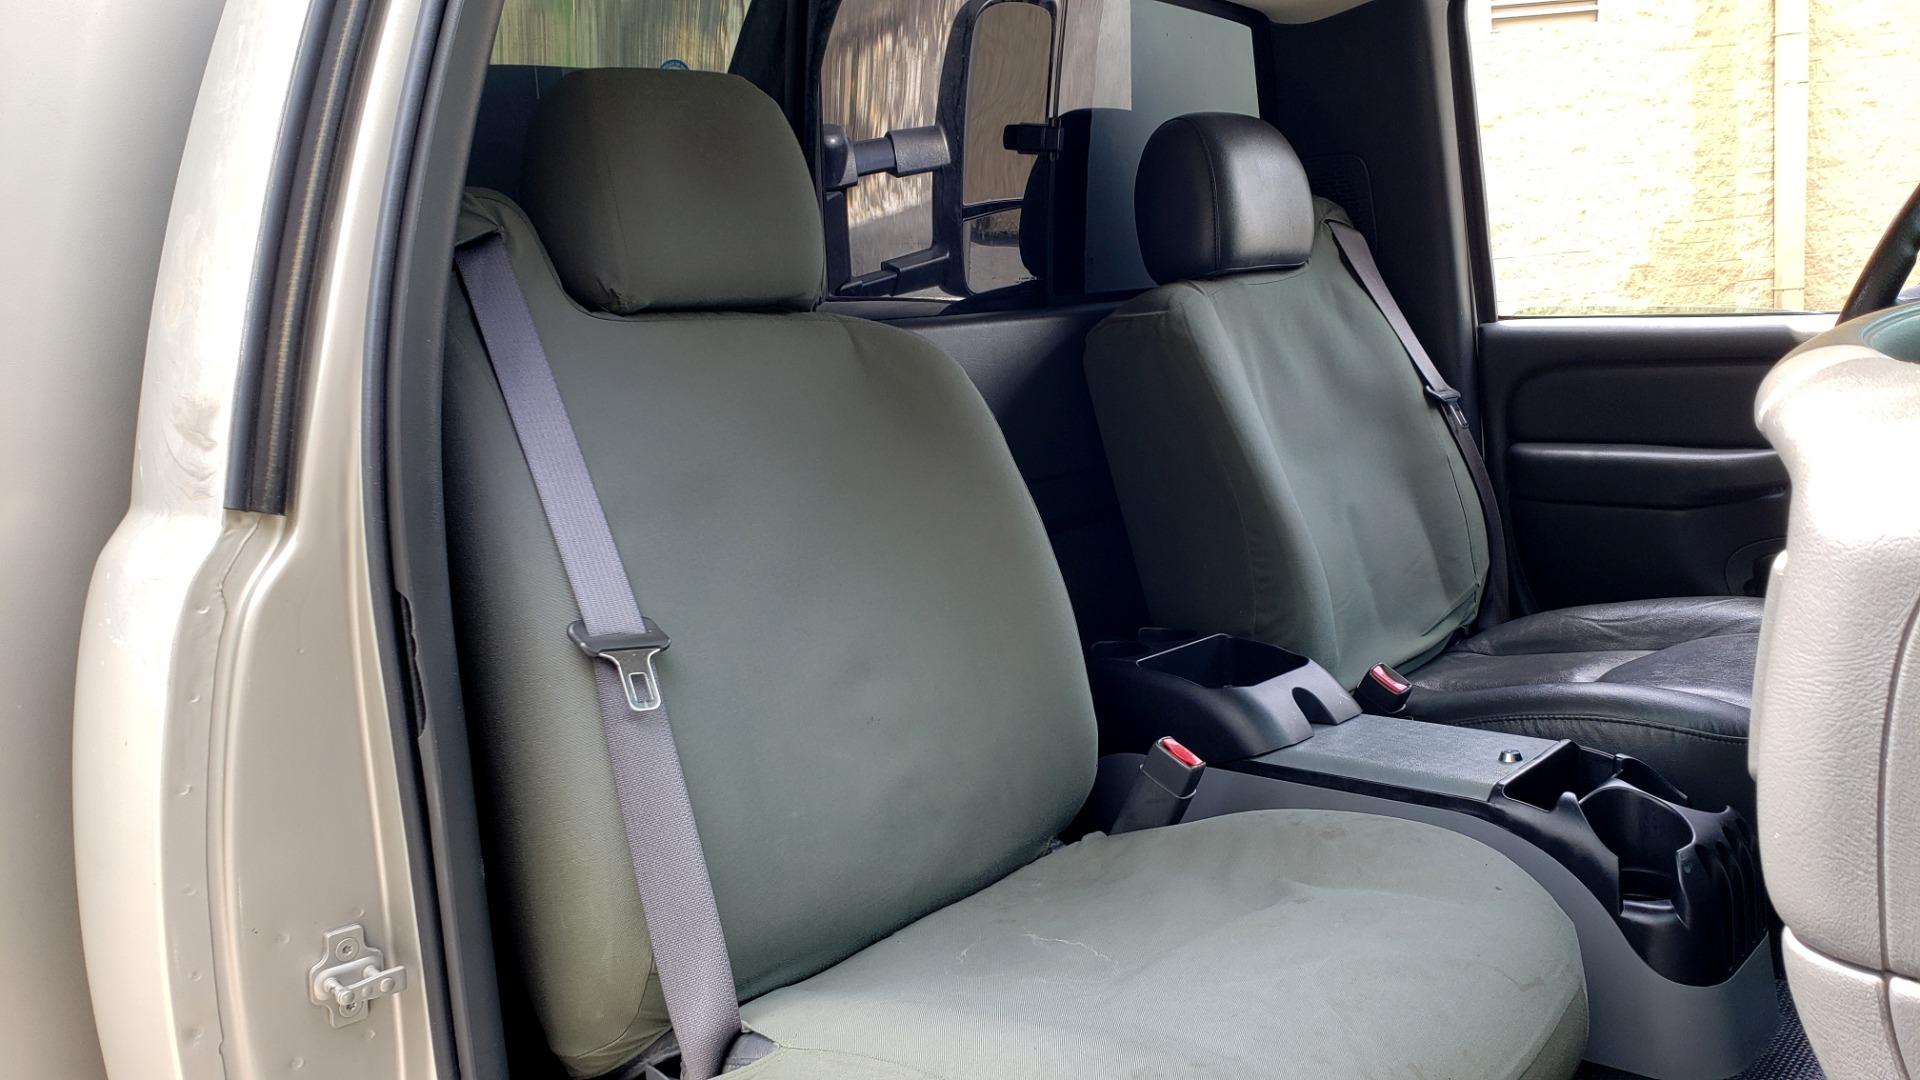 Used 2005 Chevrolet SILVERADO 3500 DRW / 4WD / REG CAB / 6.6L DURAMAX / DOOMSDAY PREPPER for sale $21,595 at Formula Imports in Charlotte NC 28227 52